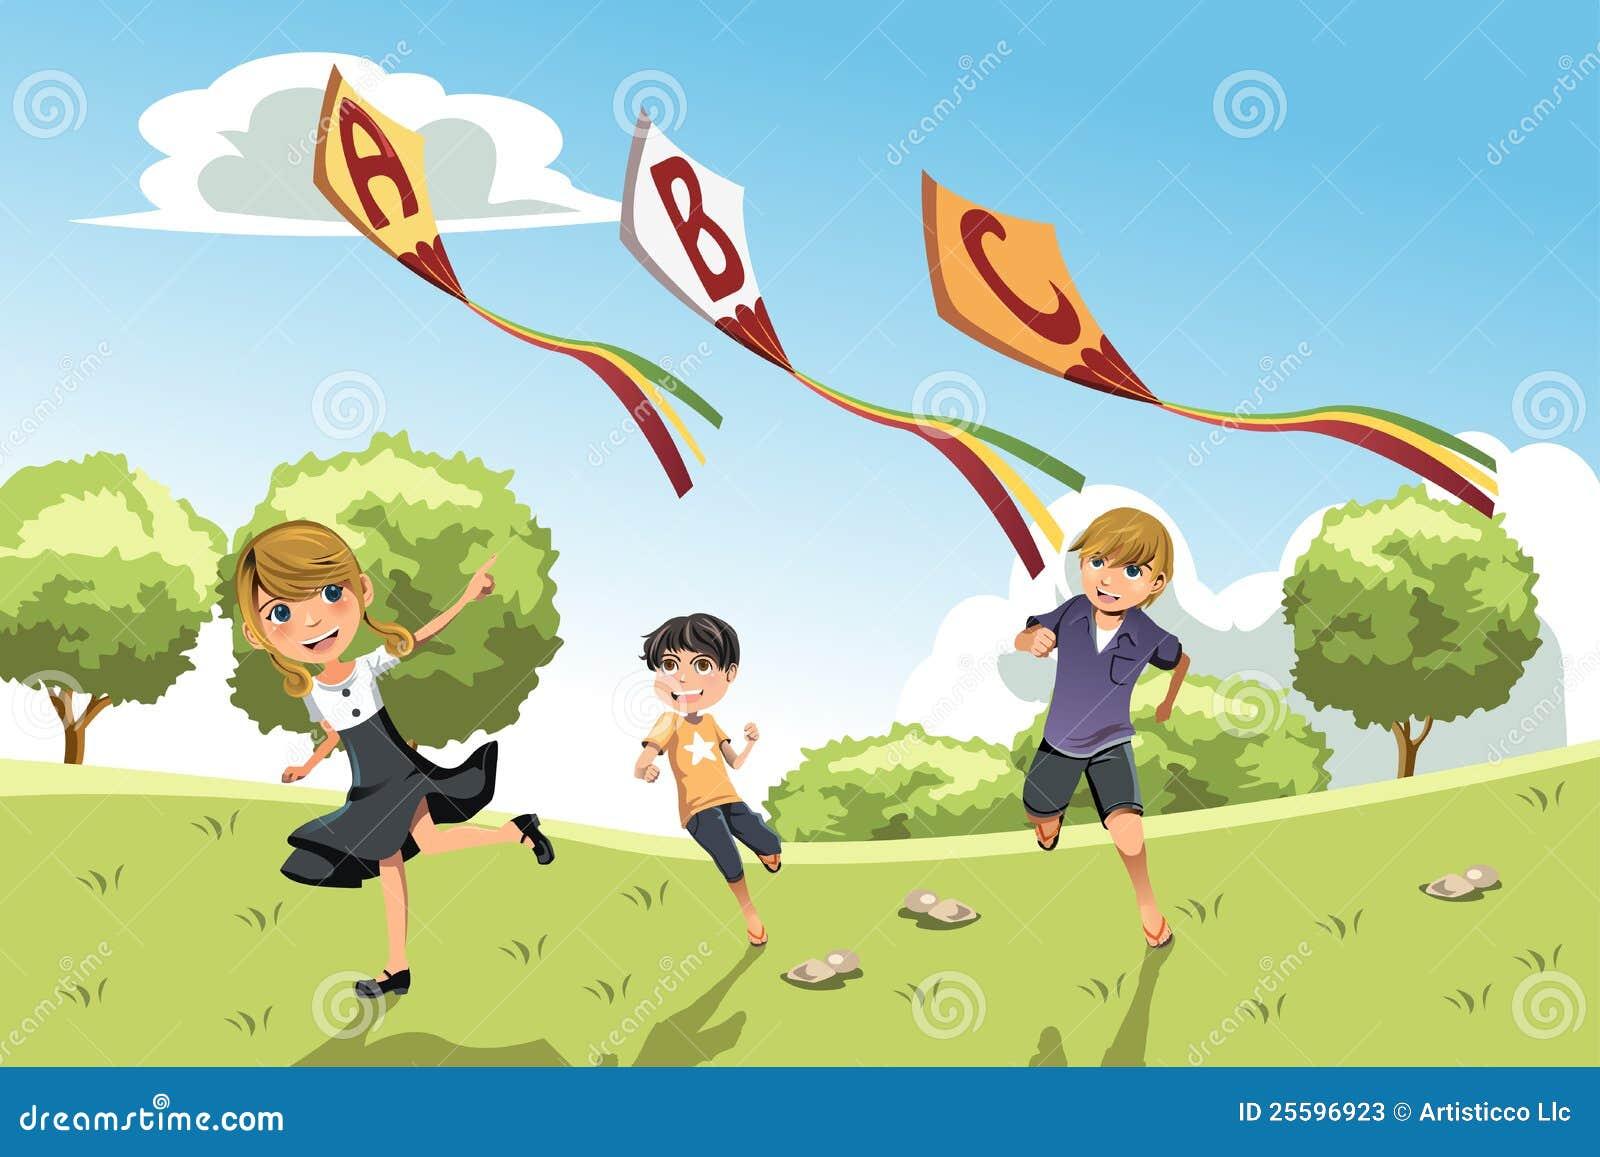 kids with alphabet kites stock photos image 25596923